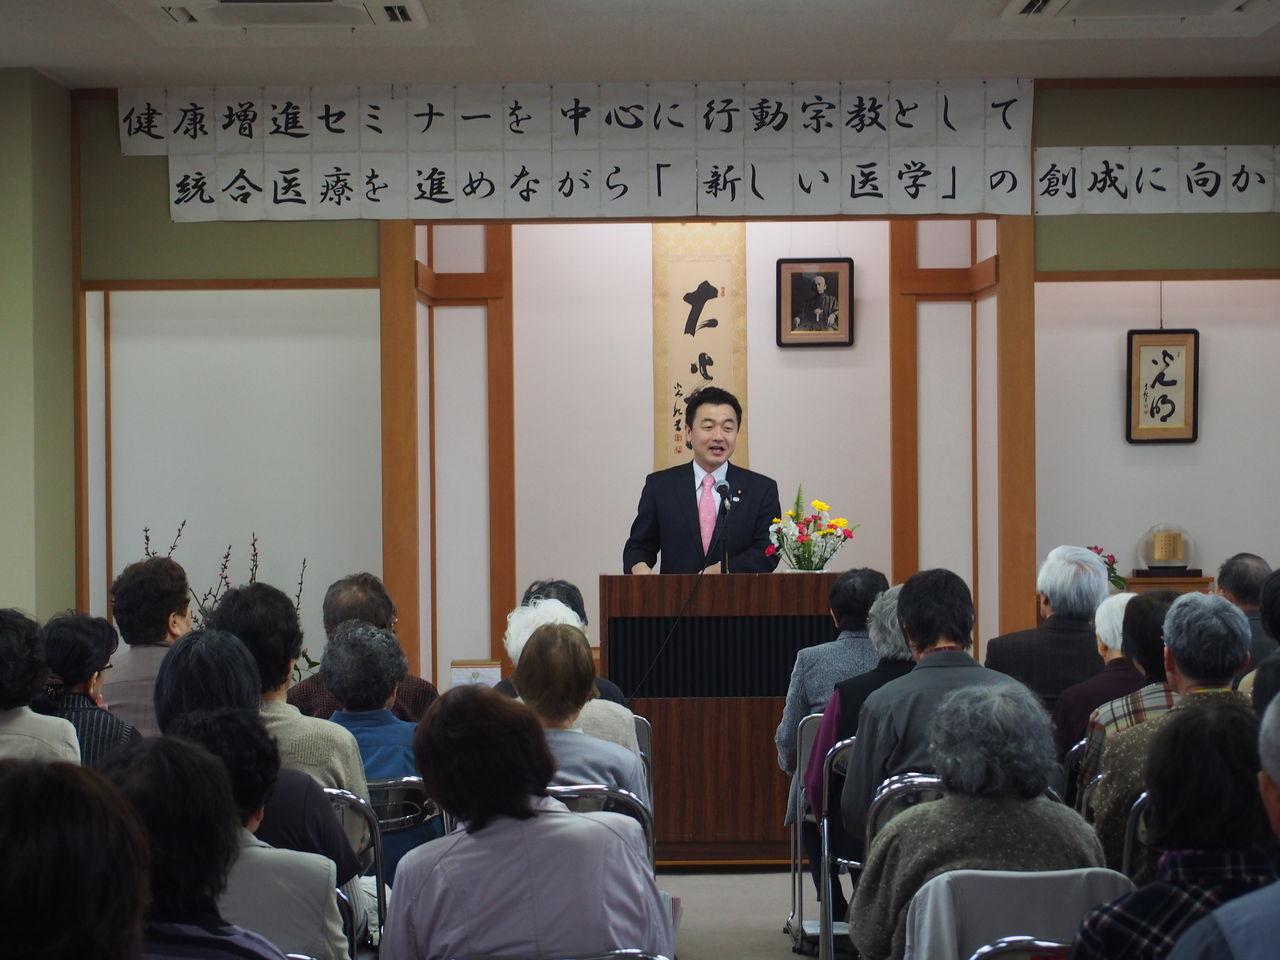 2014:04:06:1000「MOA小松」4月度感謝祭